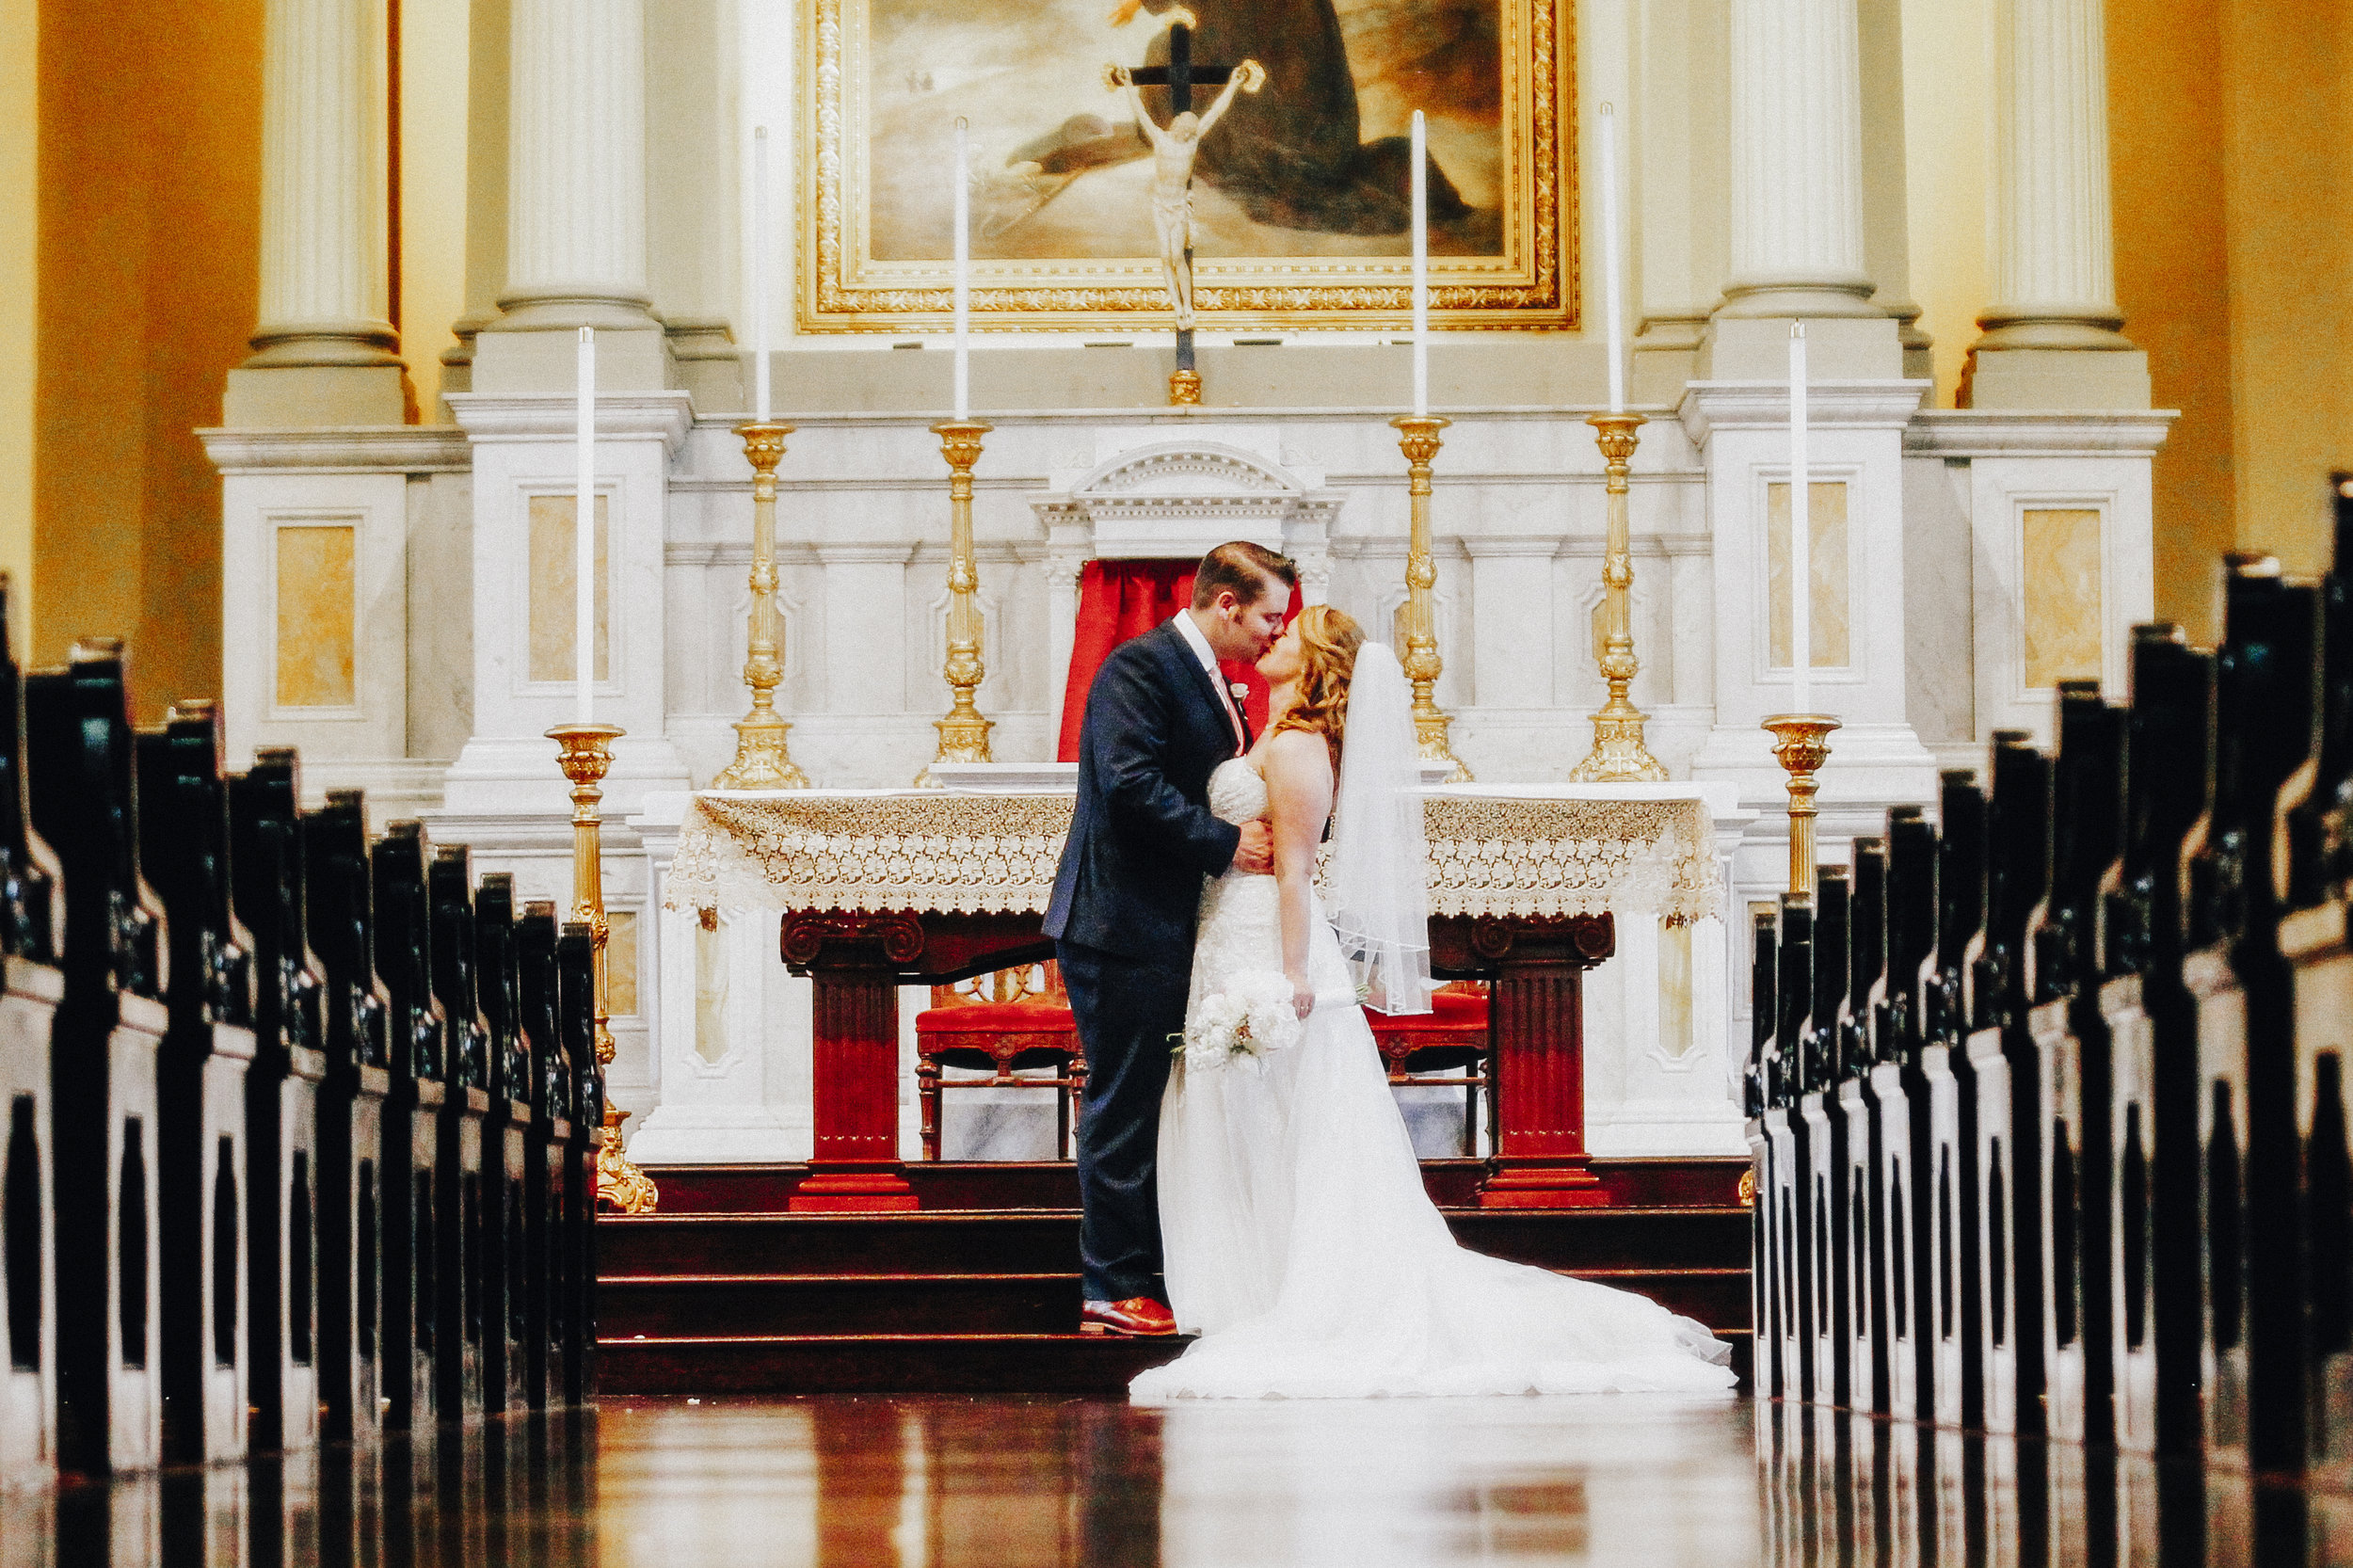 060317 MD Jessica Swing + Christopher - James Berglie Photography - Basilica & Belvedere - JBar B0603.JPG